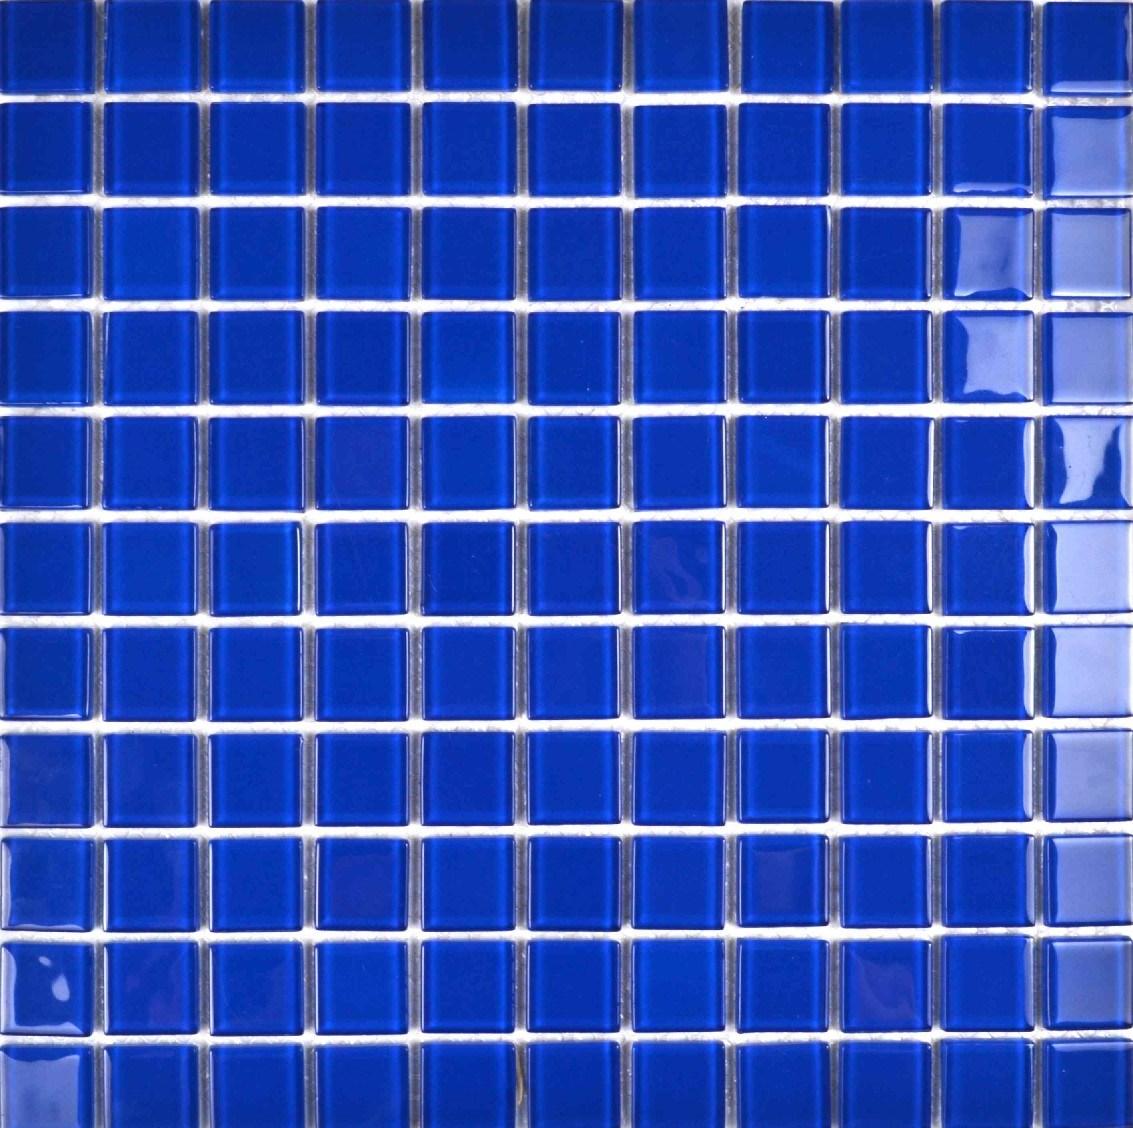 China blue swimming pool mosaic tile glass bathroom tile pool tile pool glass mosaic china for How to clean mosaic tiles in swimming pool